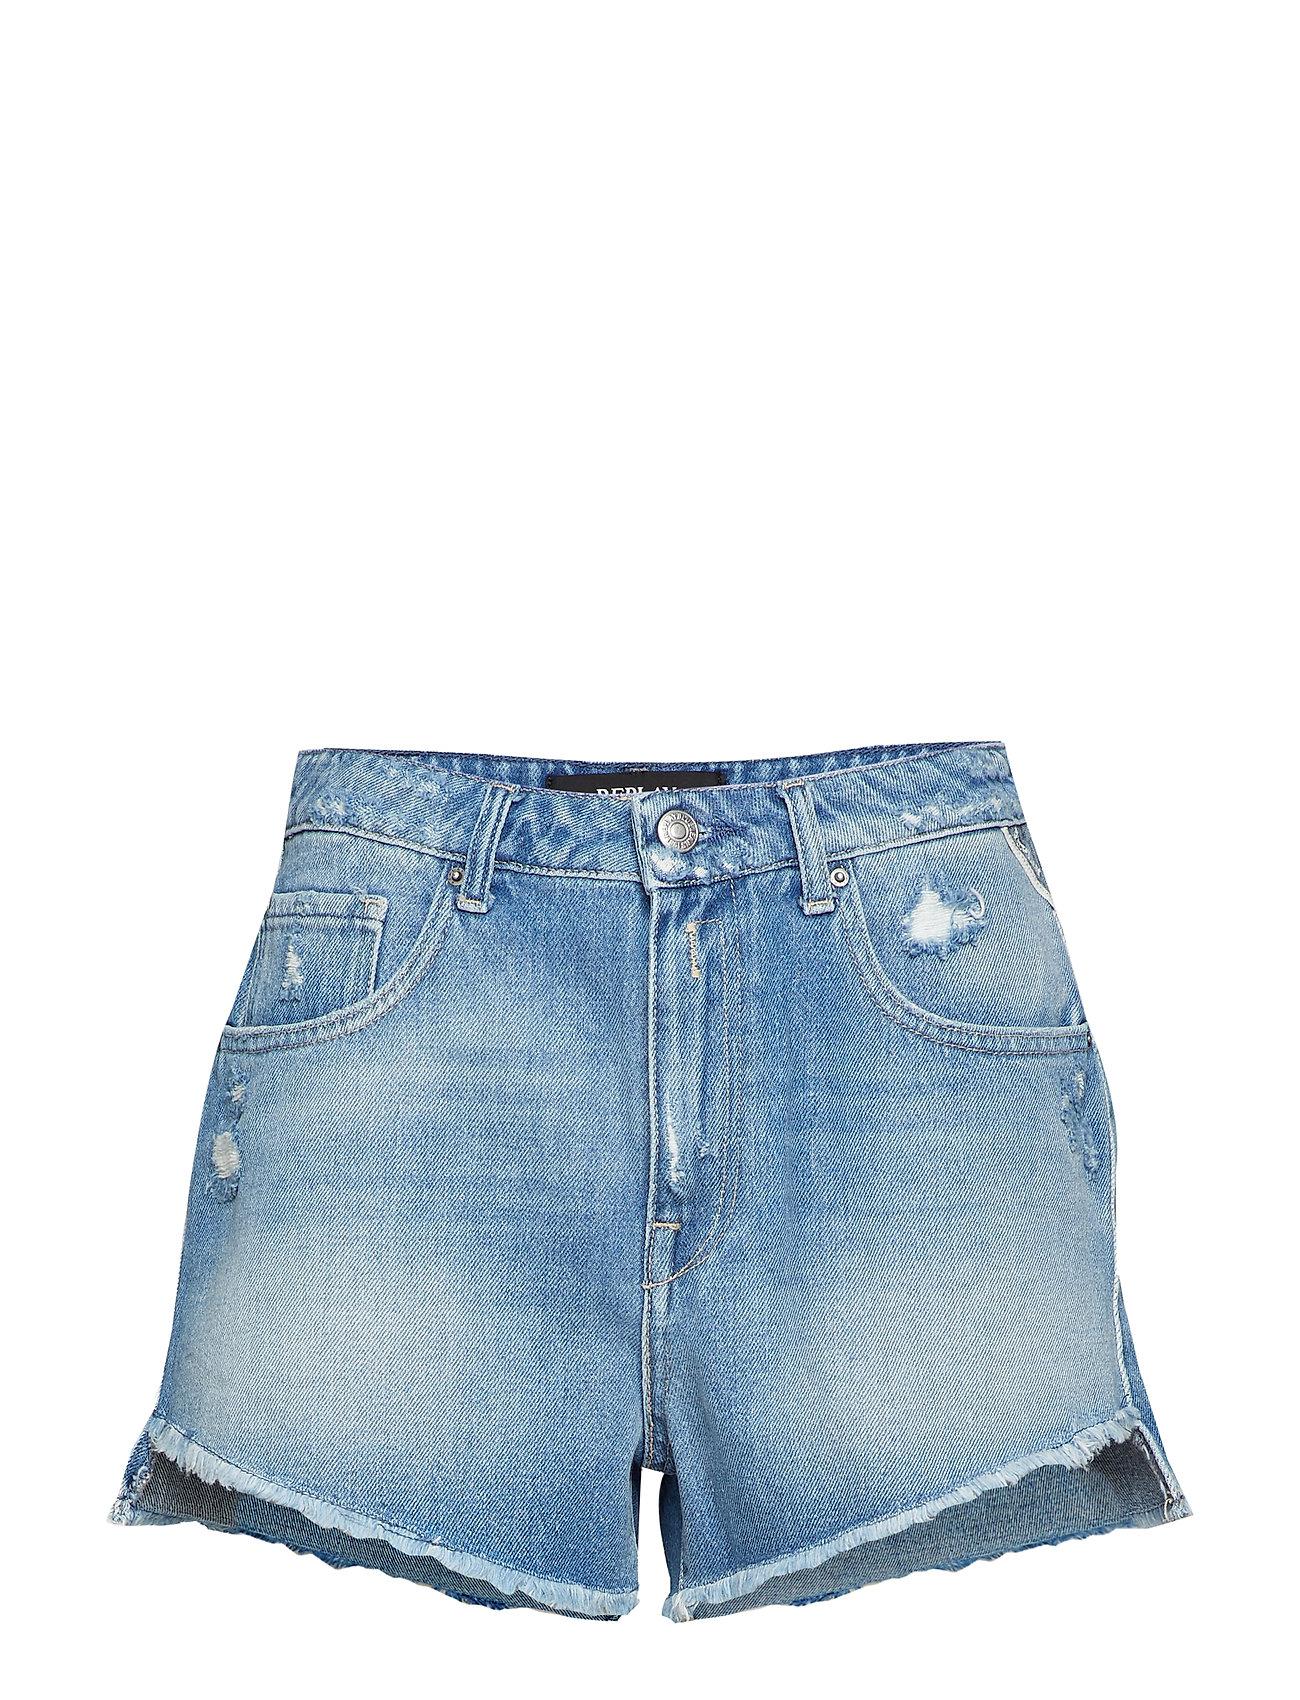 Replay Denim Shorts - MEDIUM BLUE